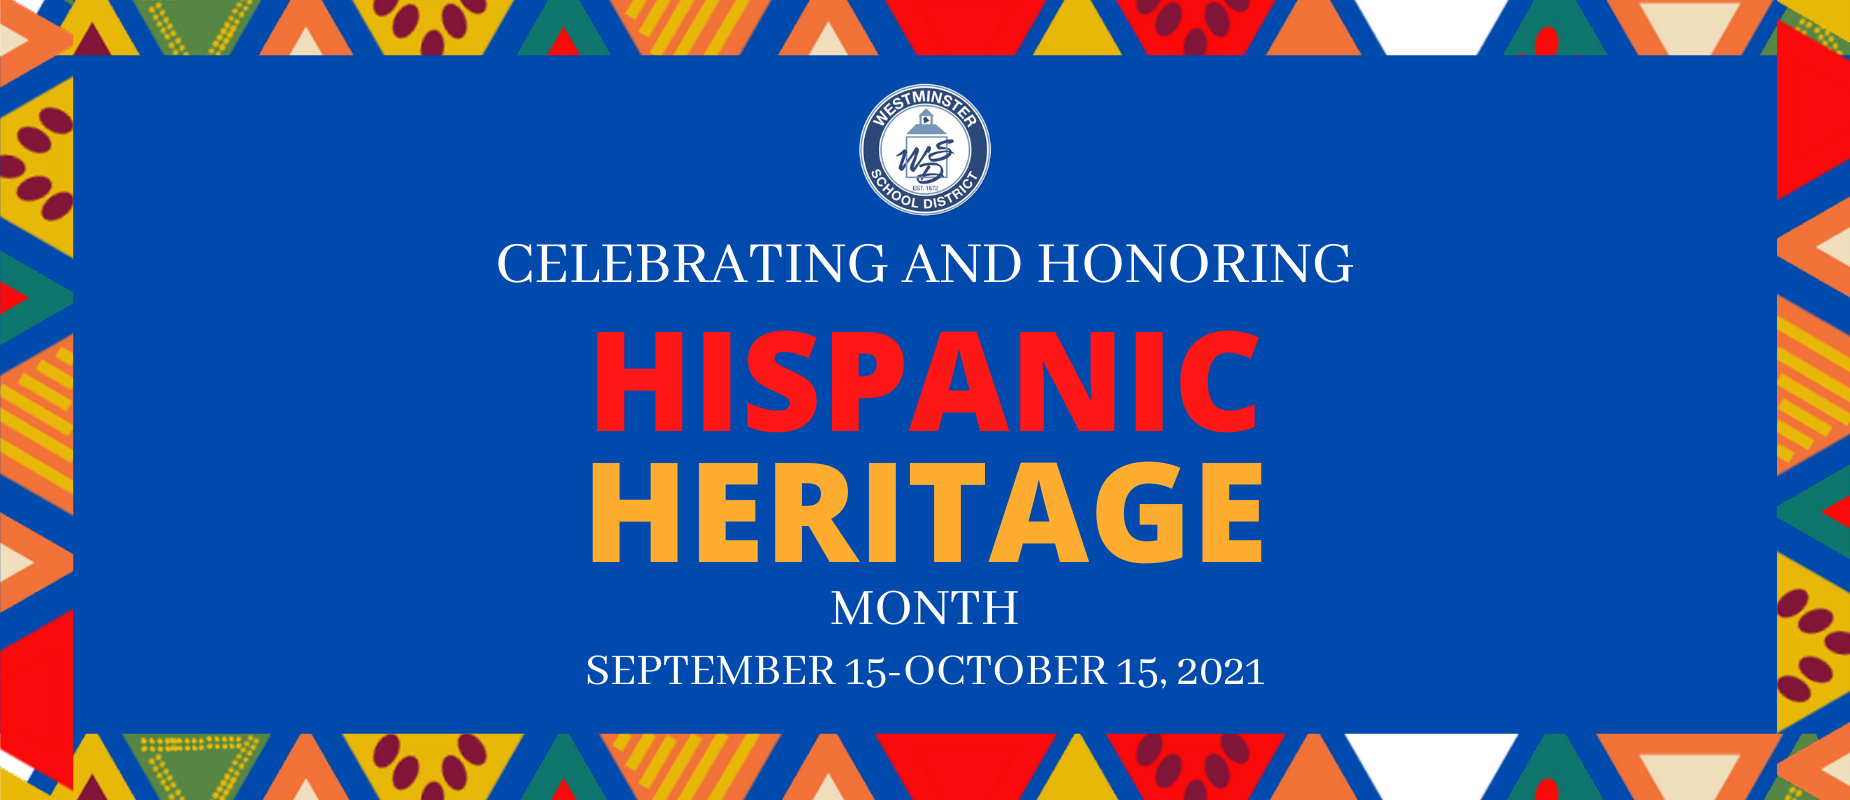 Celebrating Hispanic Heritage Month, September 15-October 15, 2021